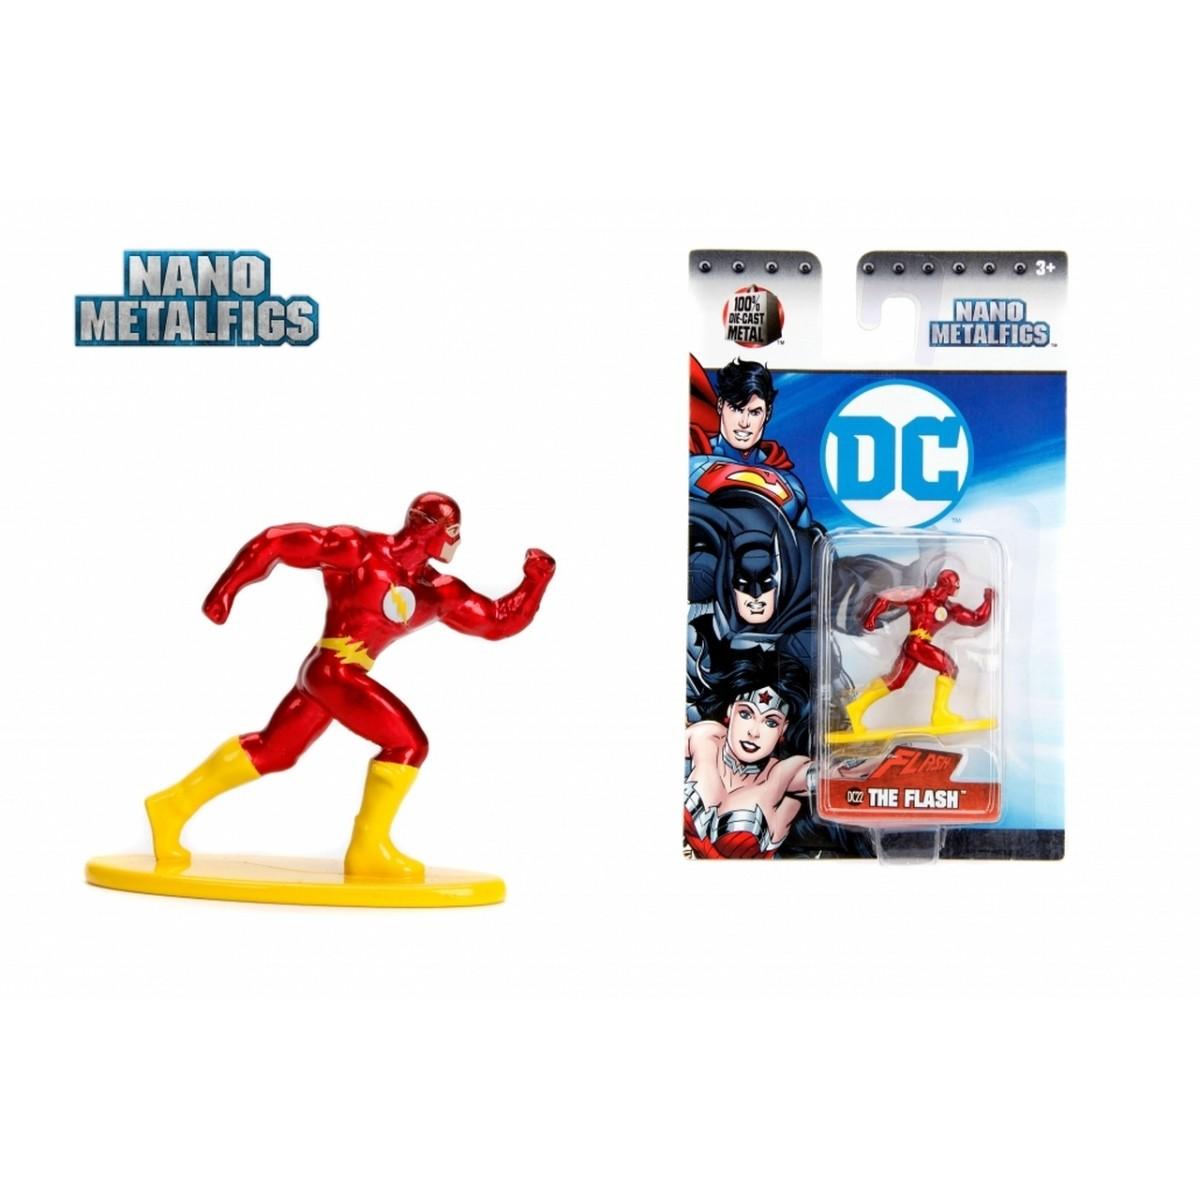 Nano Metalfigs: The Flash: DC Comics (DC22) - Jada Toys